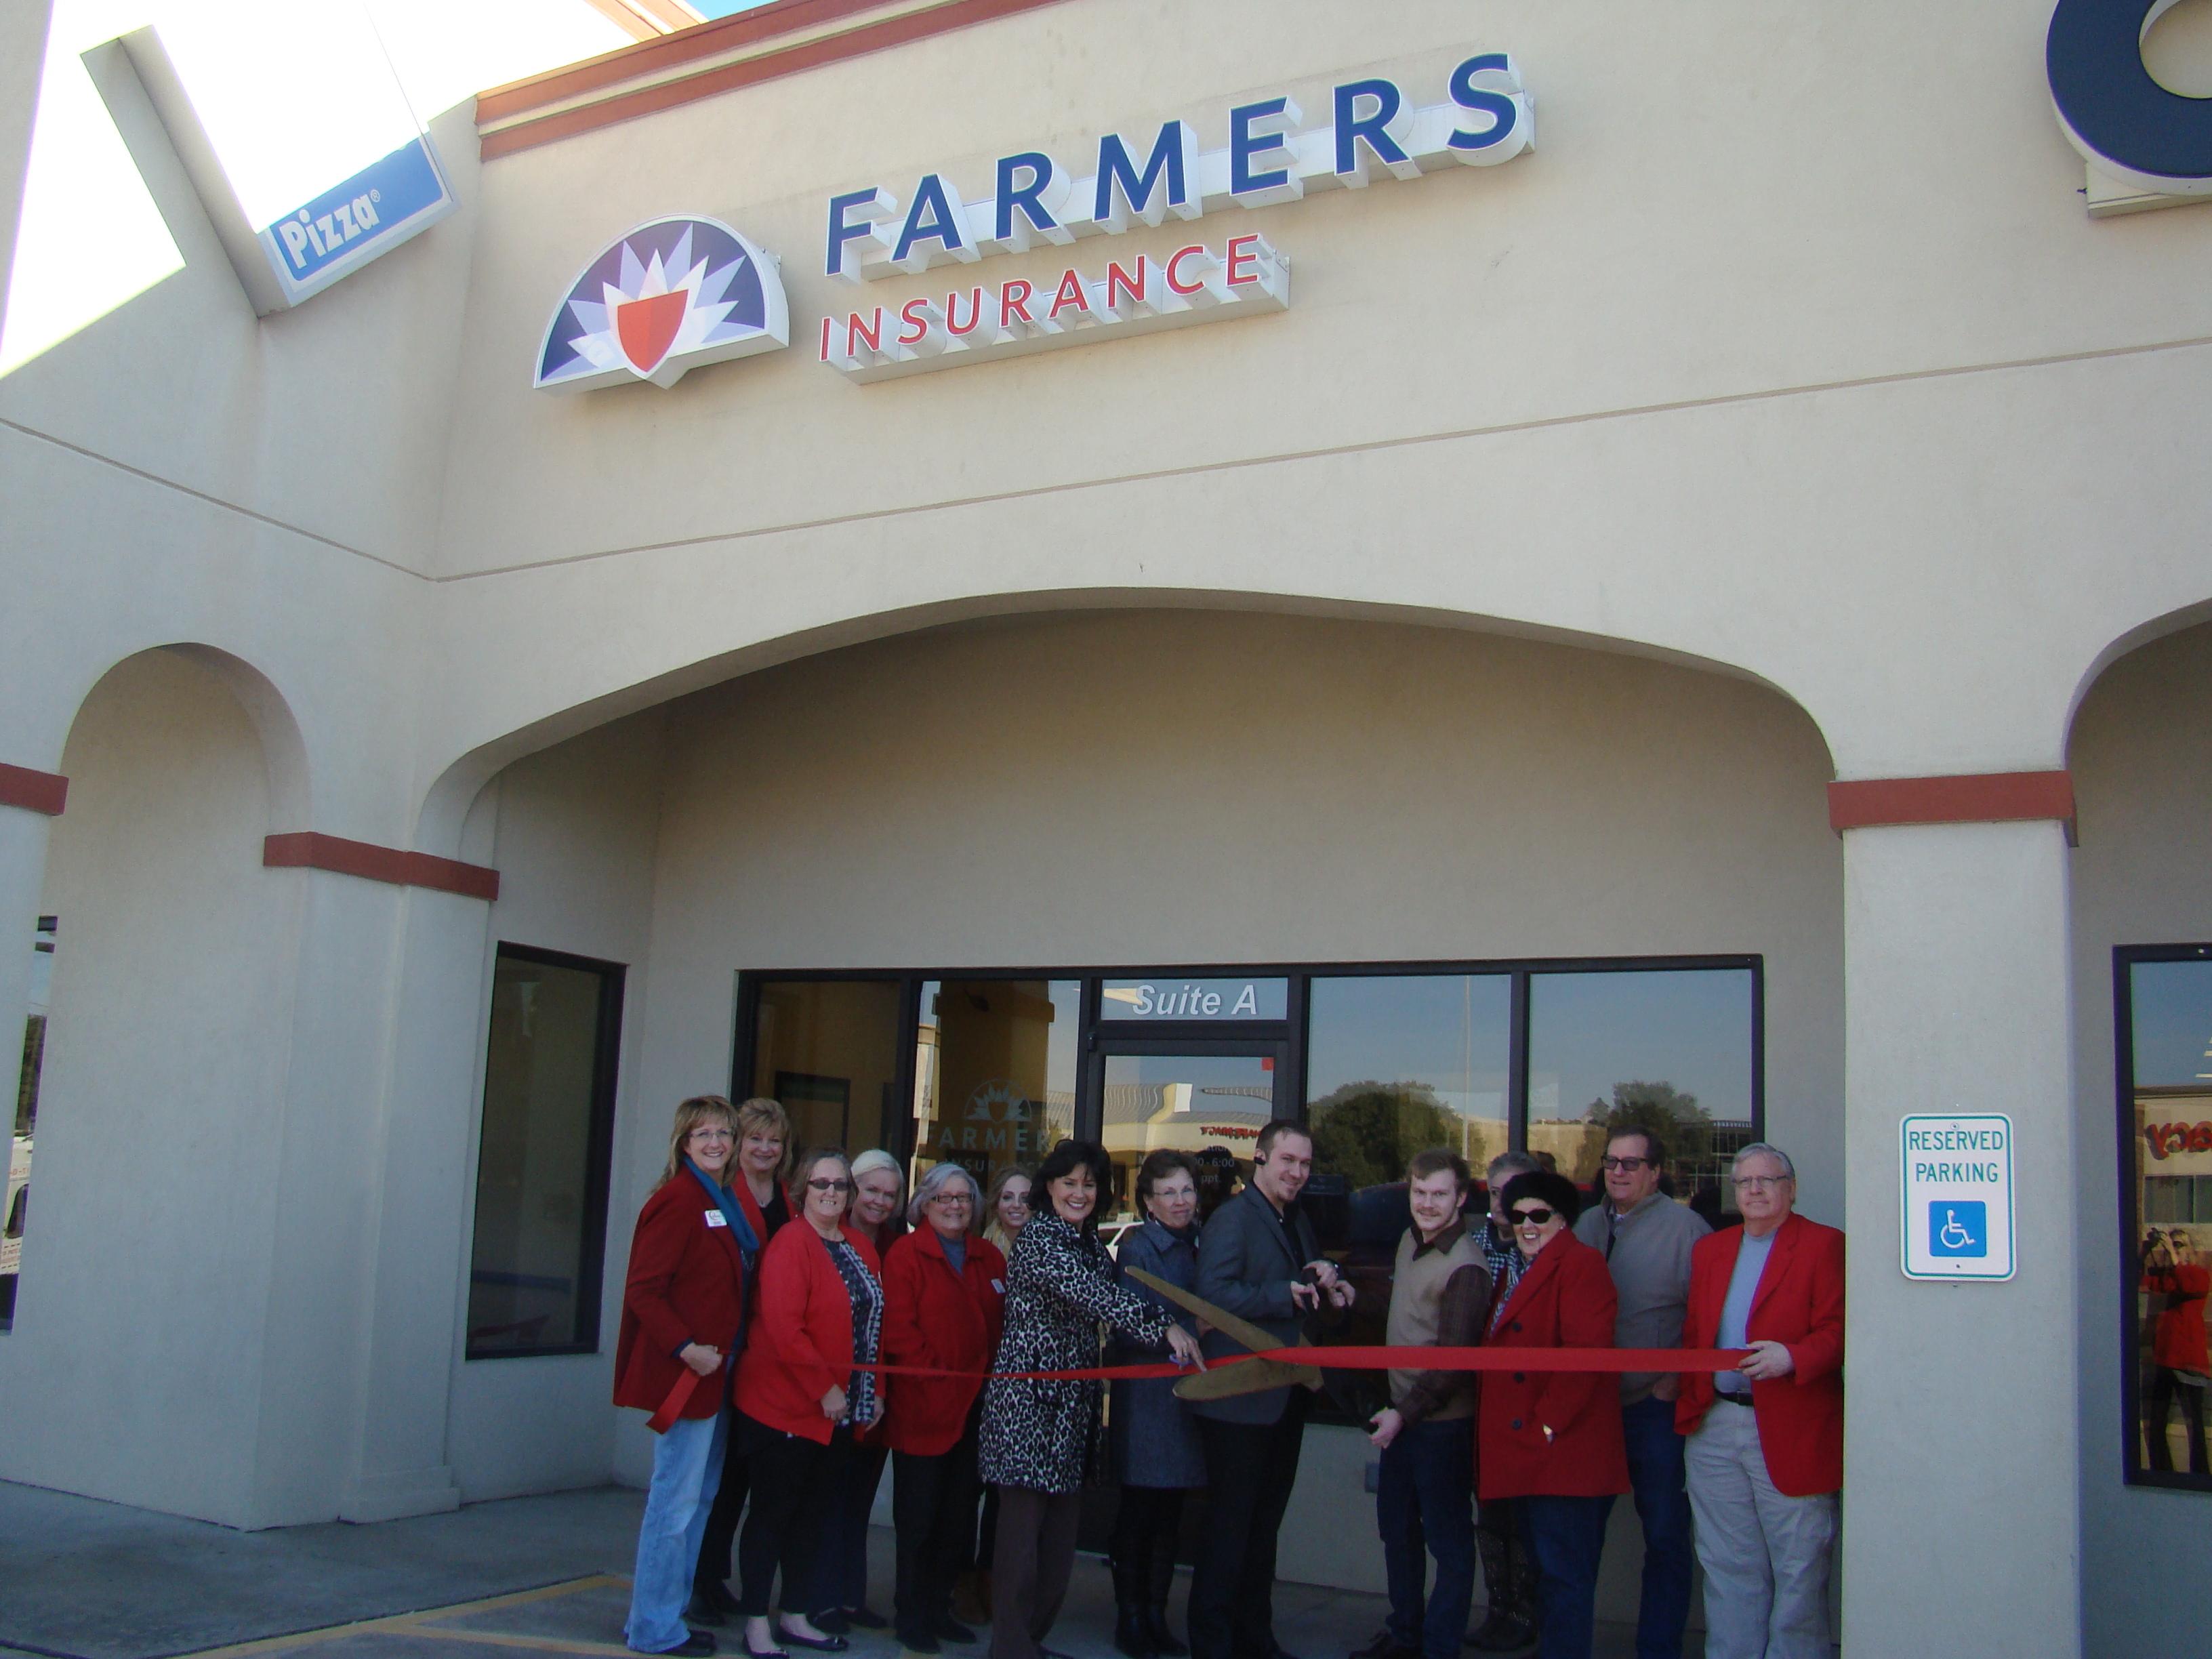 Farmers Insurance - Blake Jones image 2